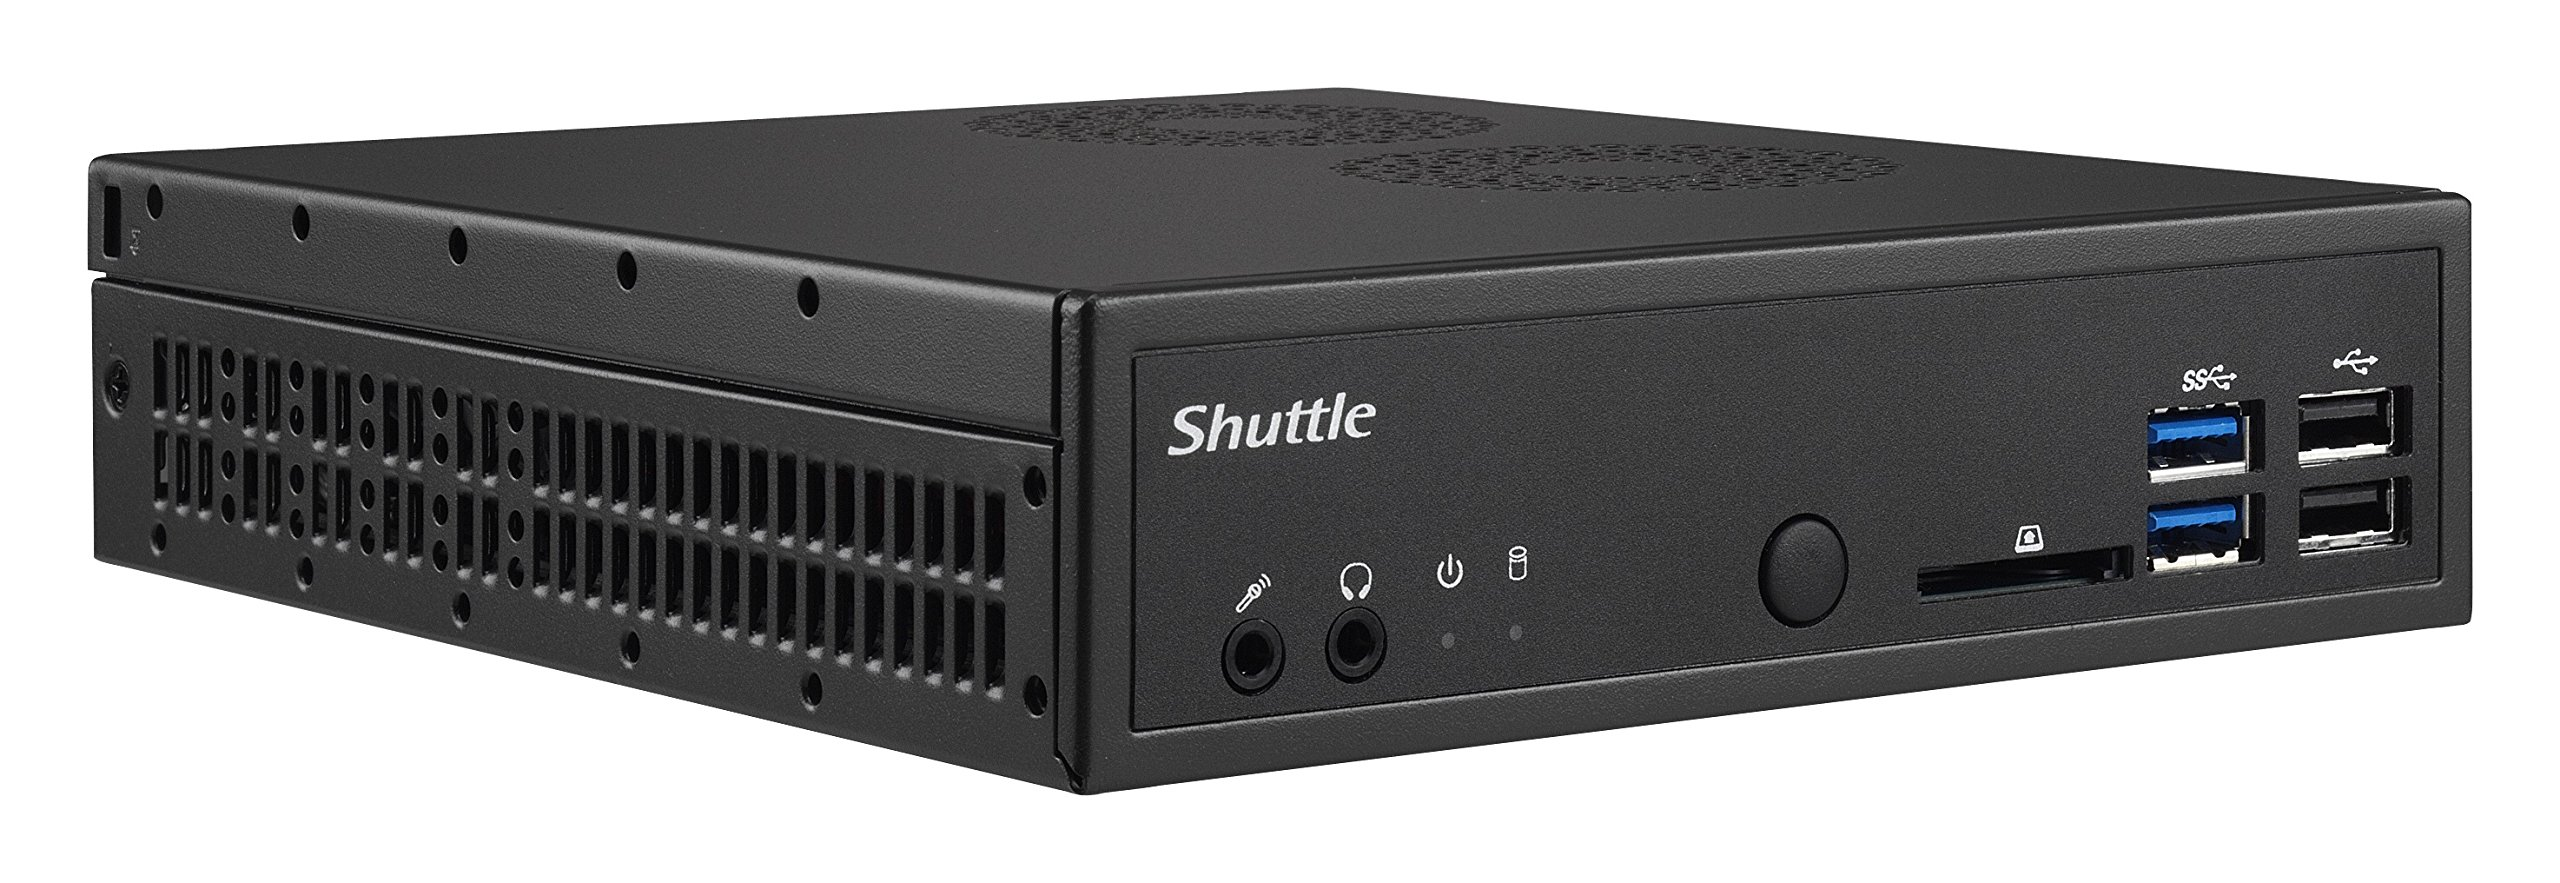 Shuttle XPC Slim DH110SE, Intel Skylake H110 chipset LGA 1151 i3/i5/i7/Pentium, Support SODIMM DDR4, Heatpipe Cooling Module